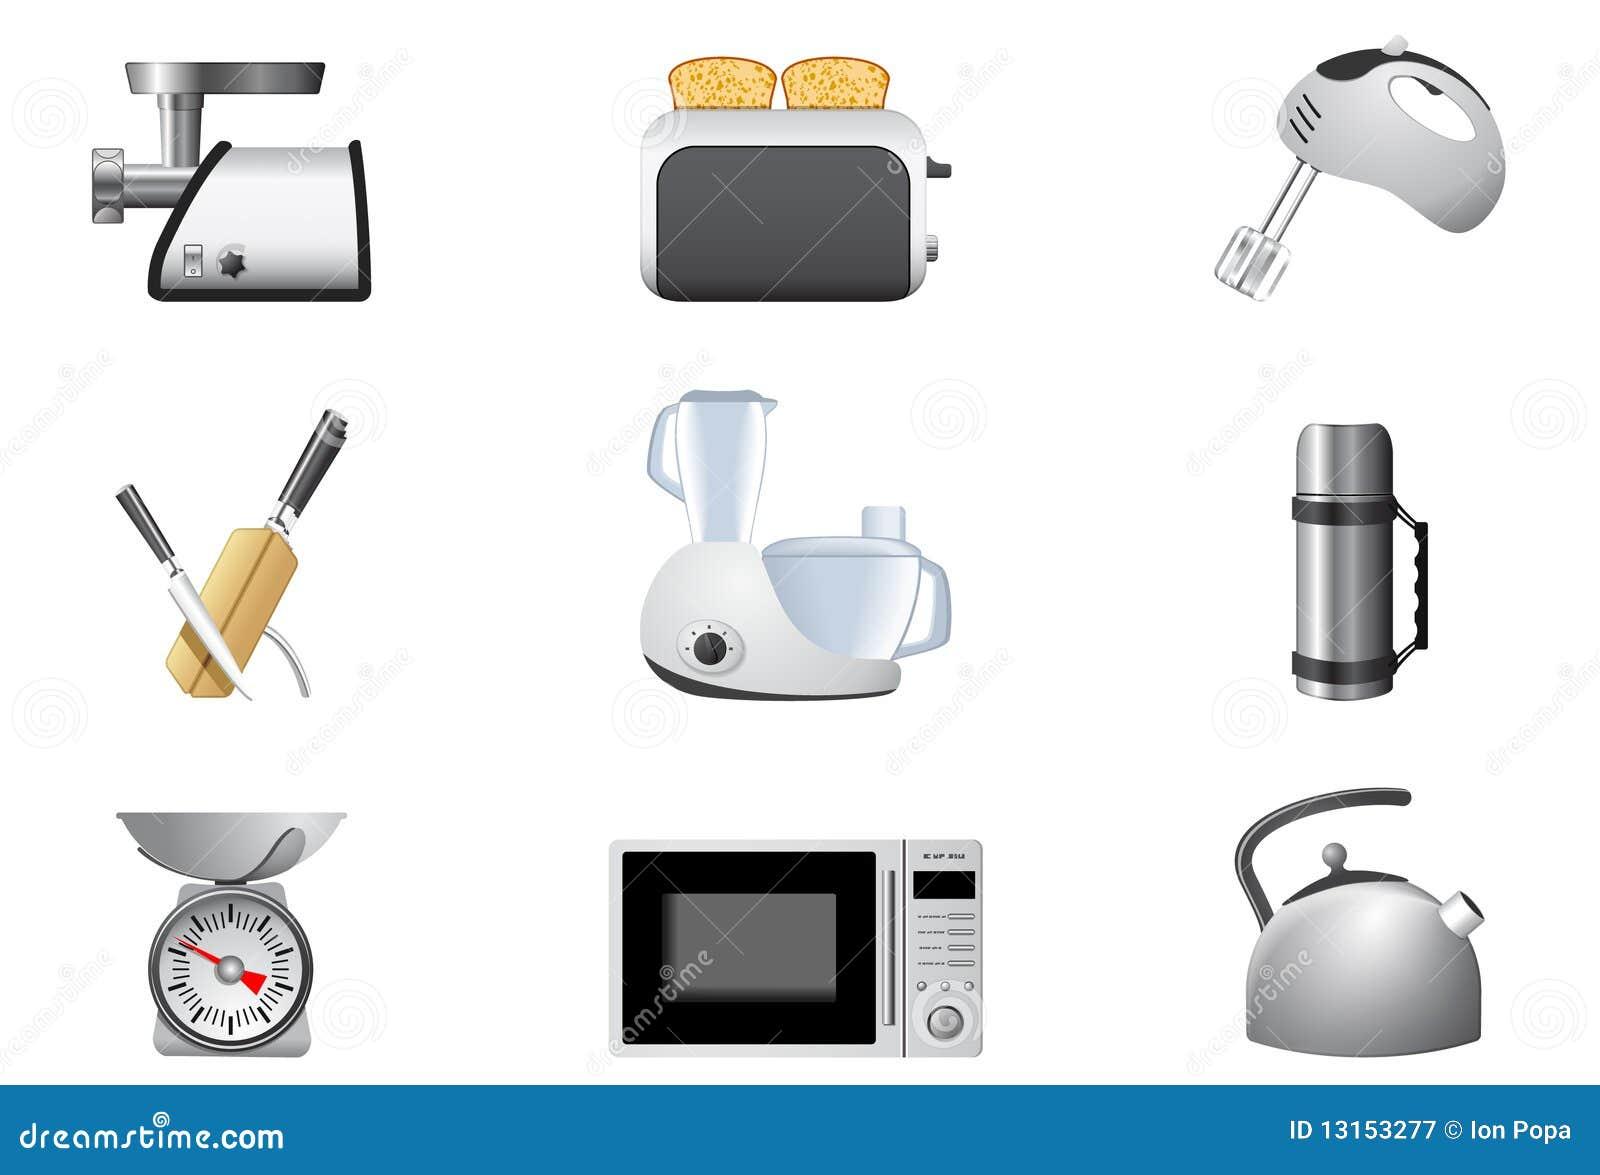 Aparatos electrodom sticos cocina fotograf a de archivo for Aparatos de cocina